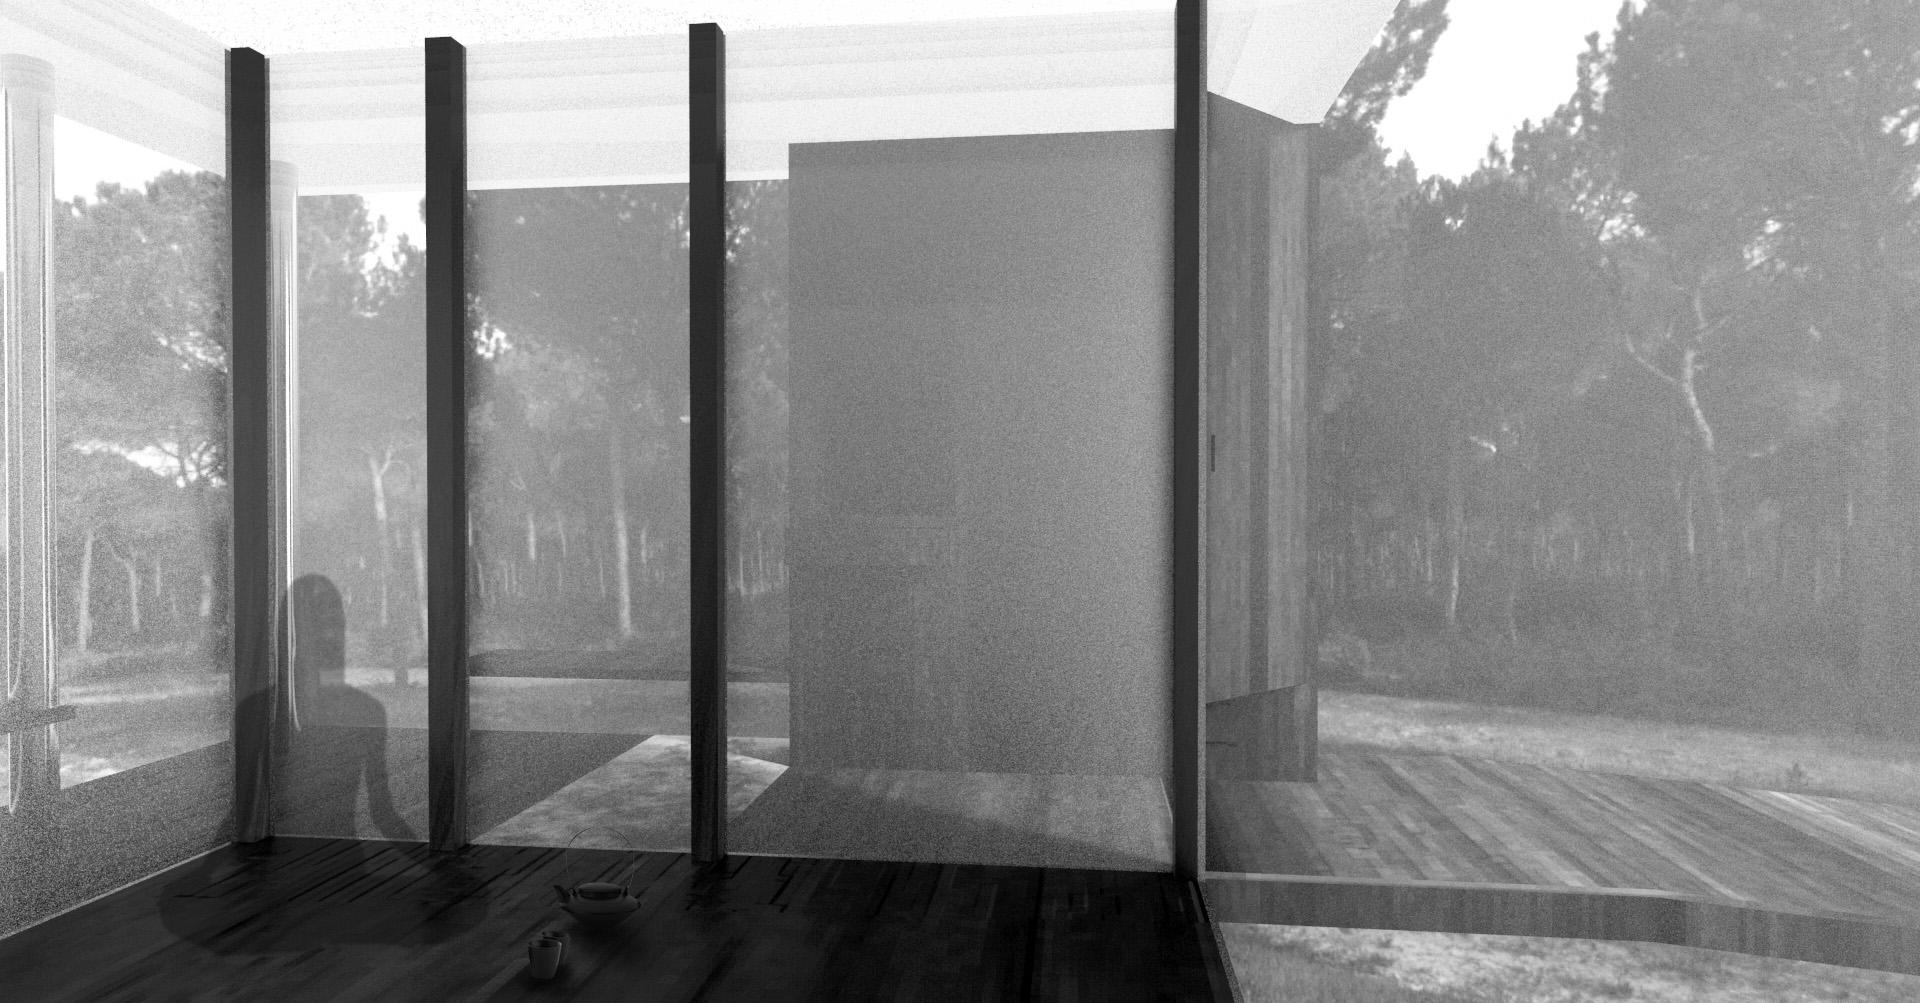 130814_bath house_meditation room 2_bw_kl.jpg